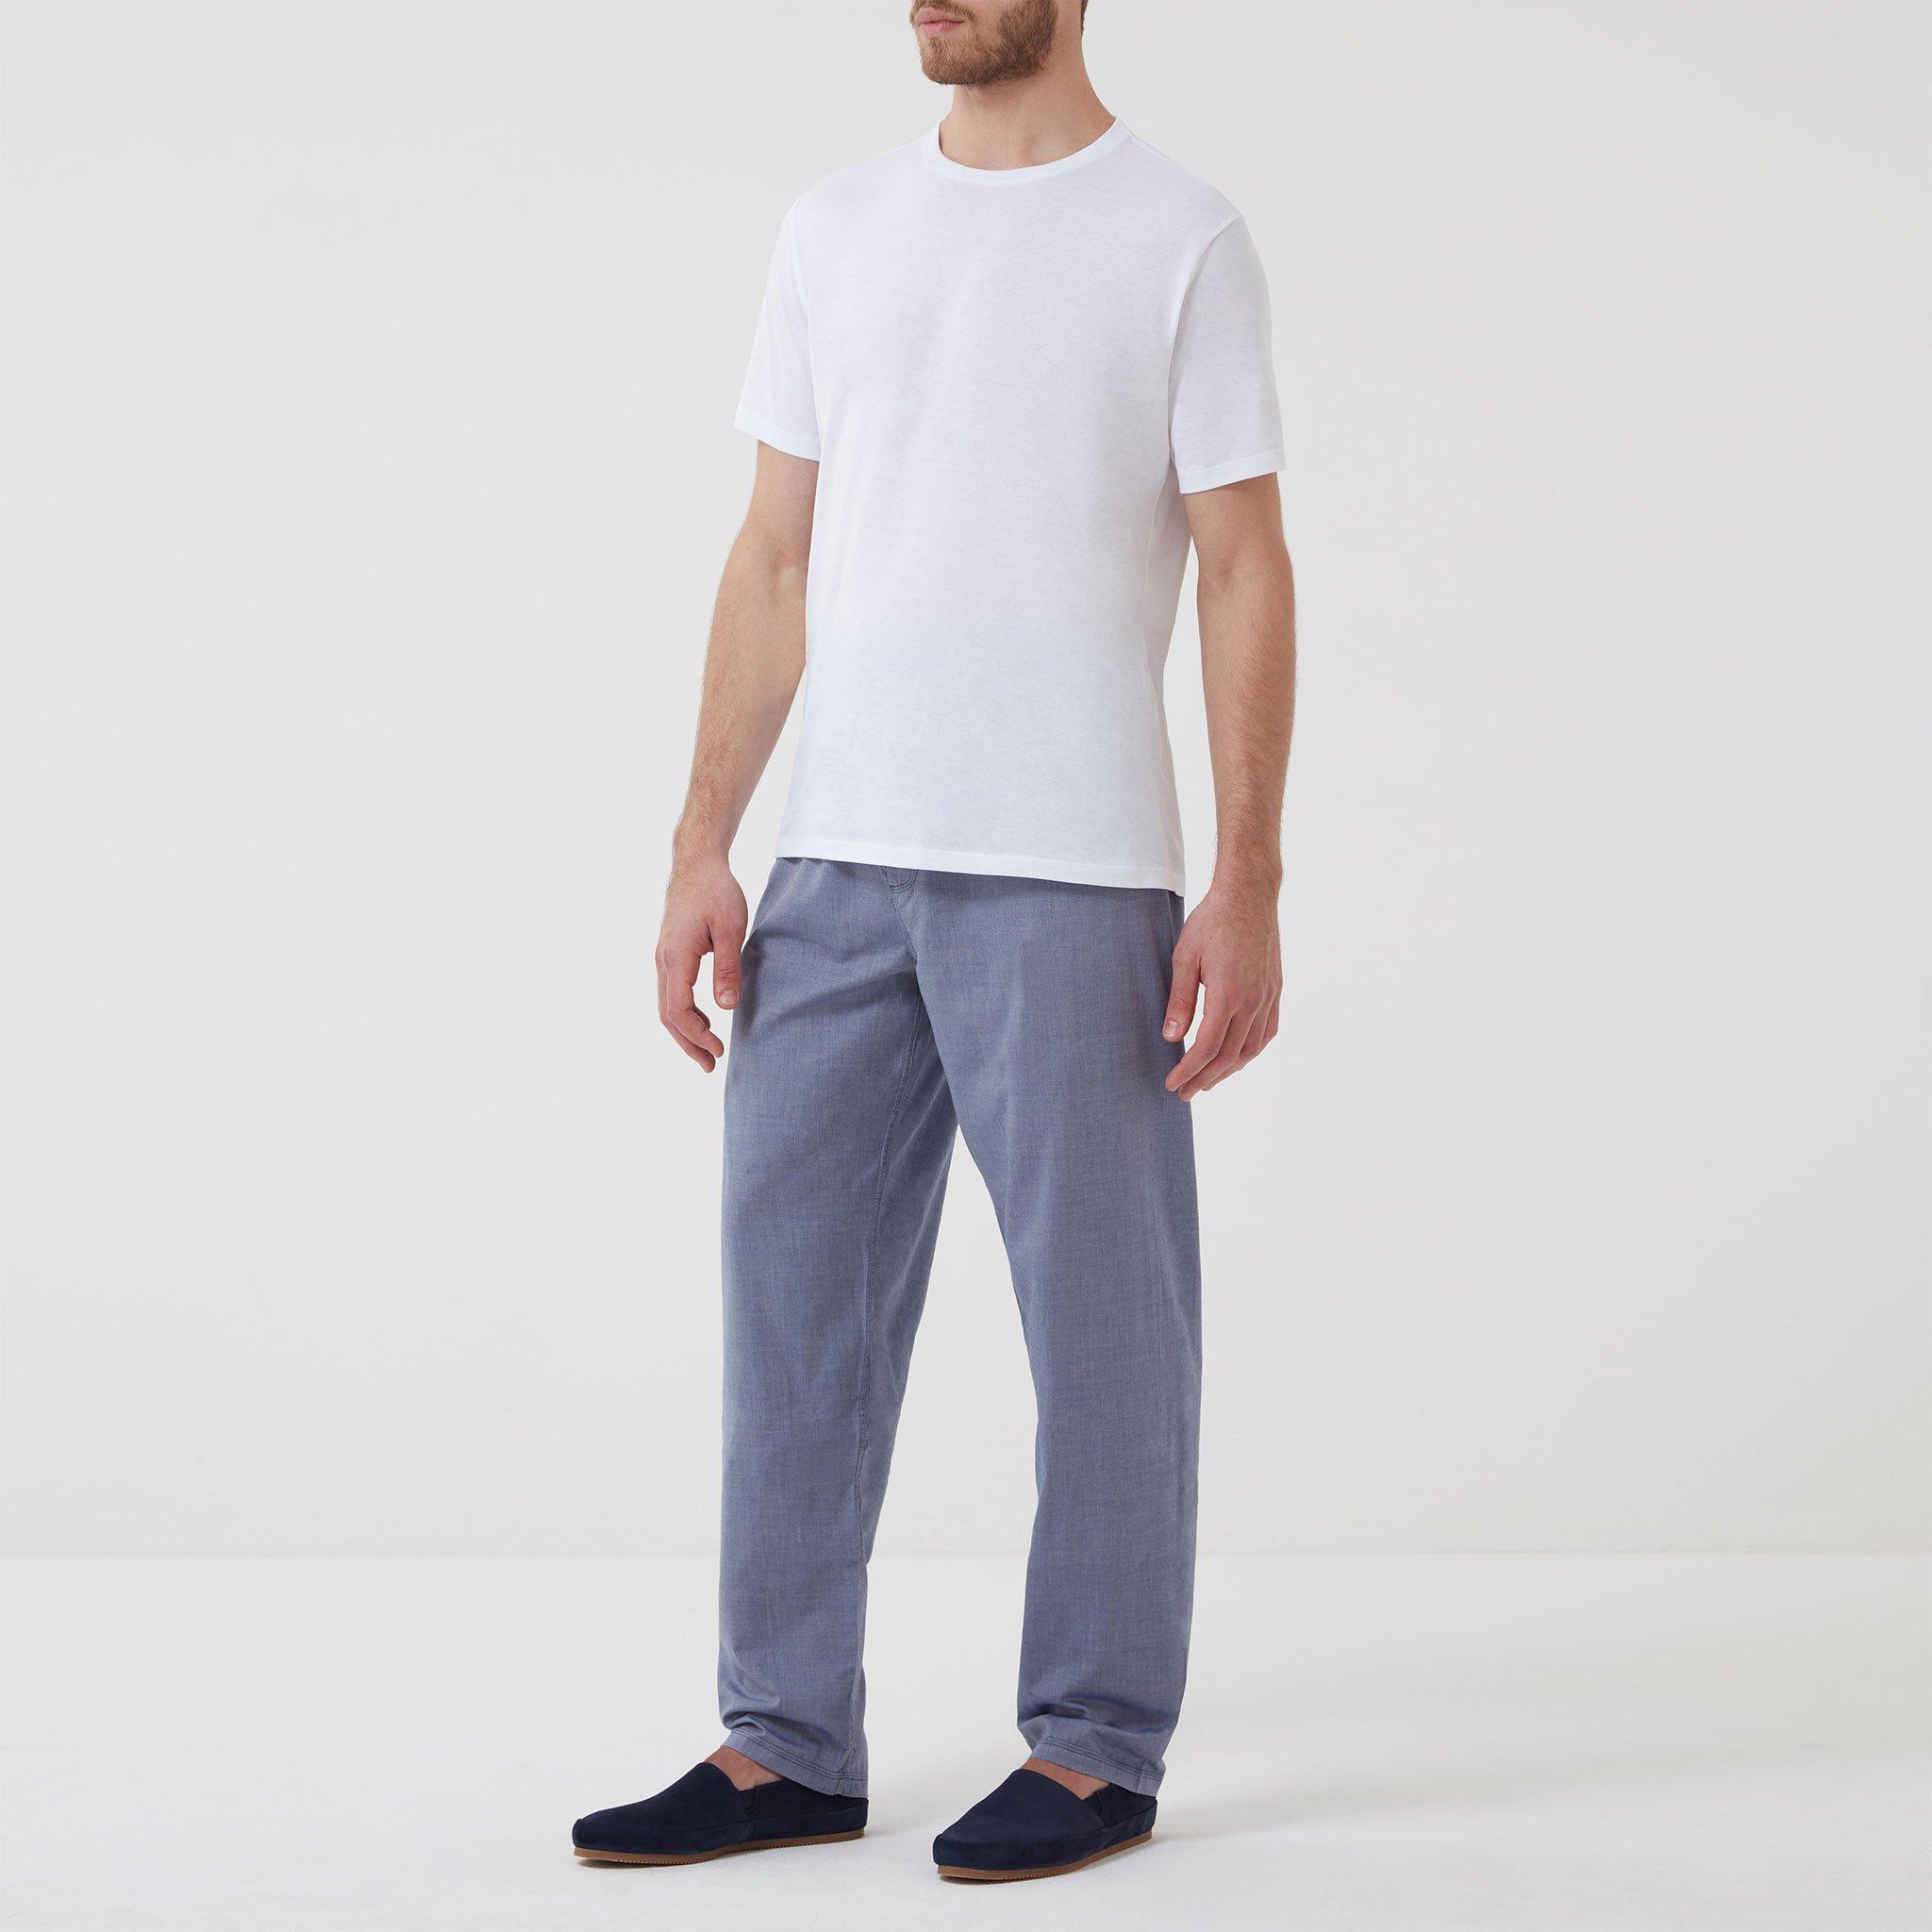 Cotton-Cashmere-Sleep-Trouser-Chambray-Model_02.jpg